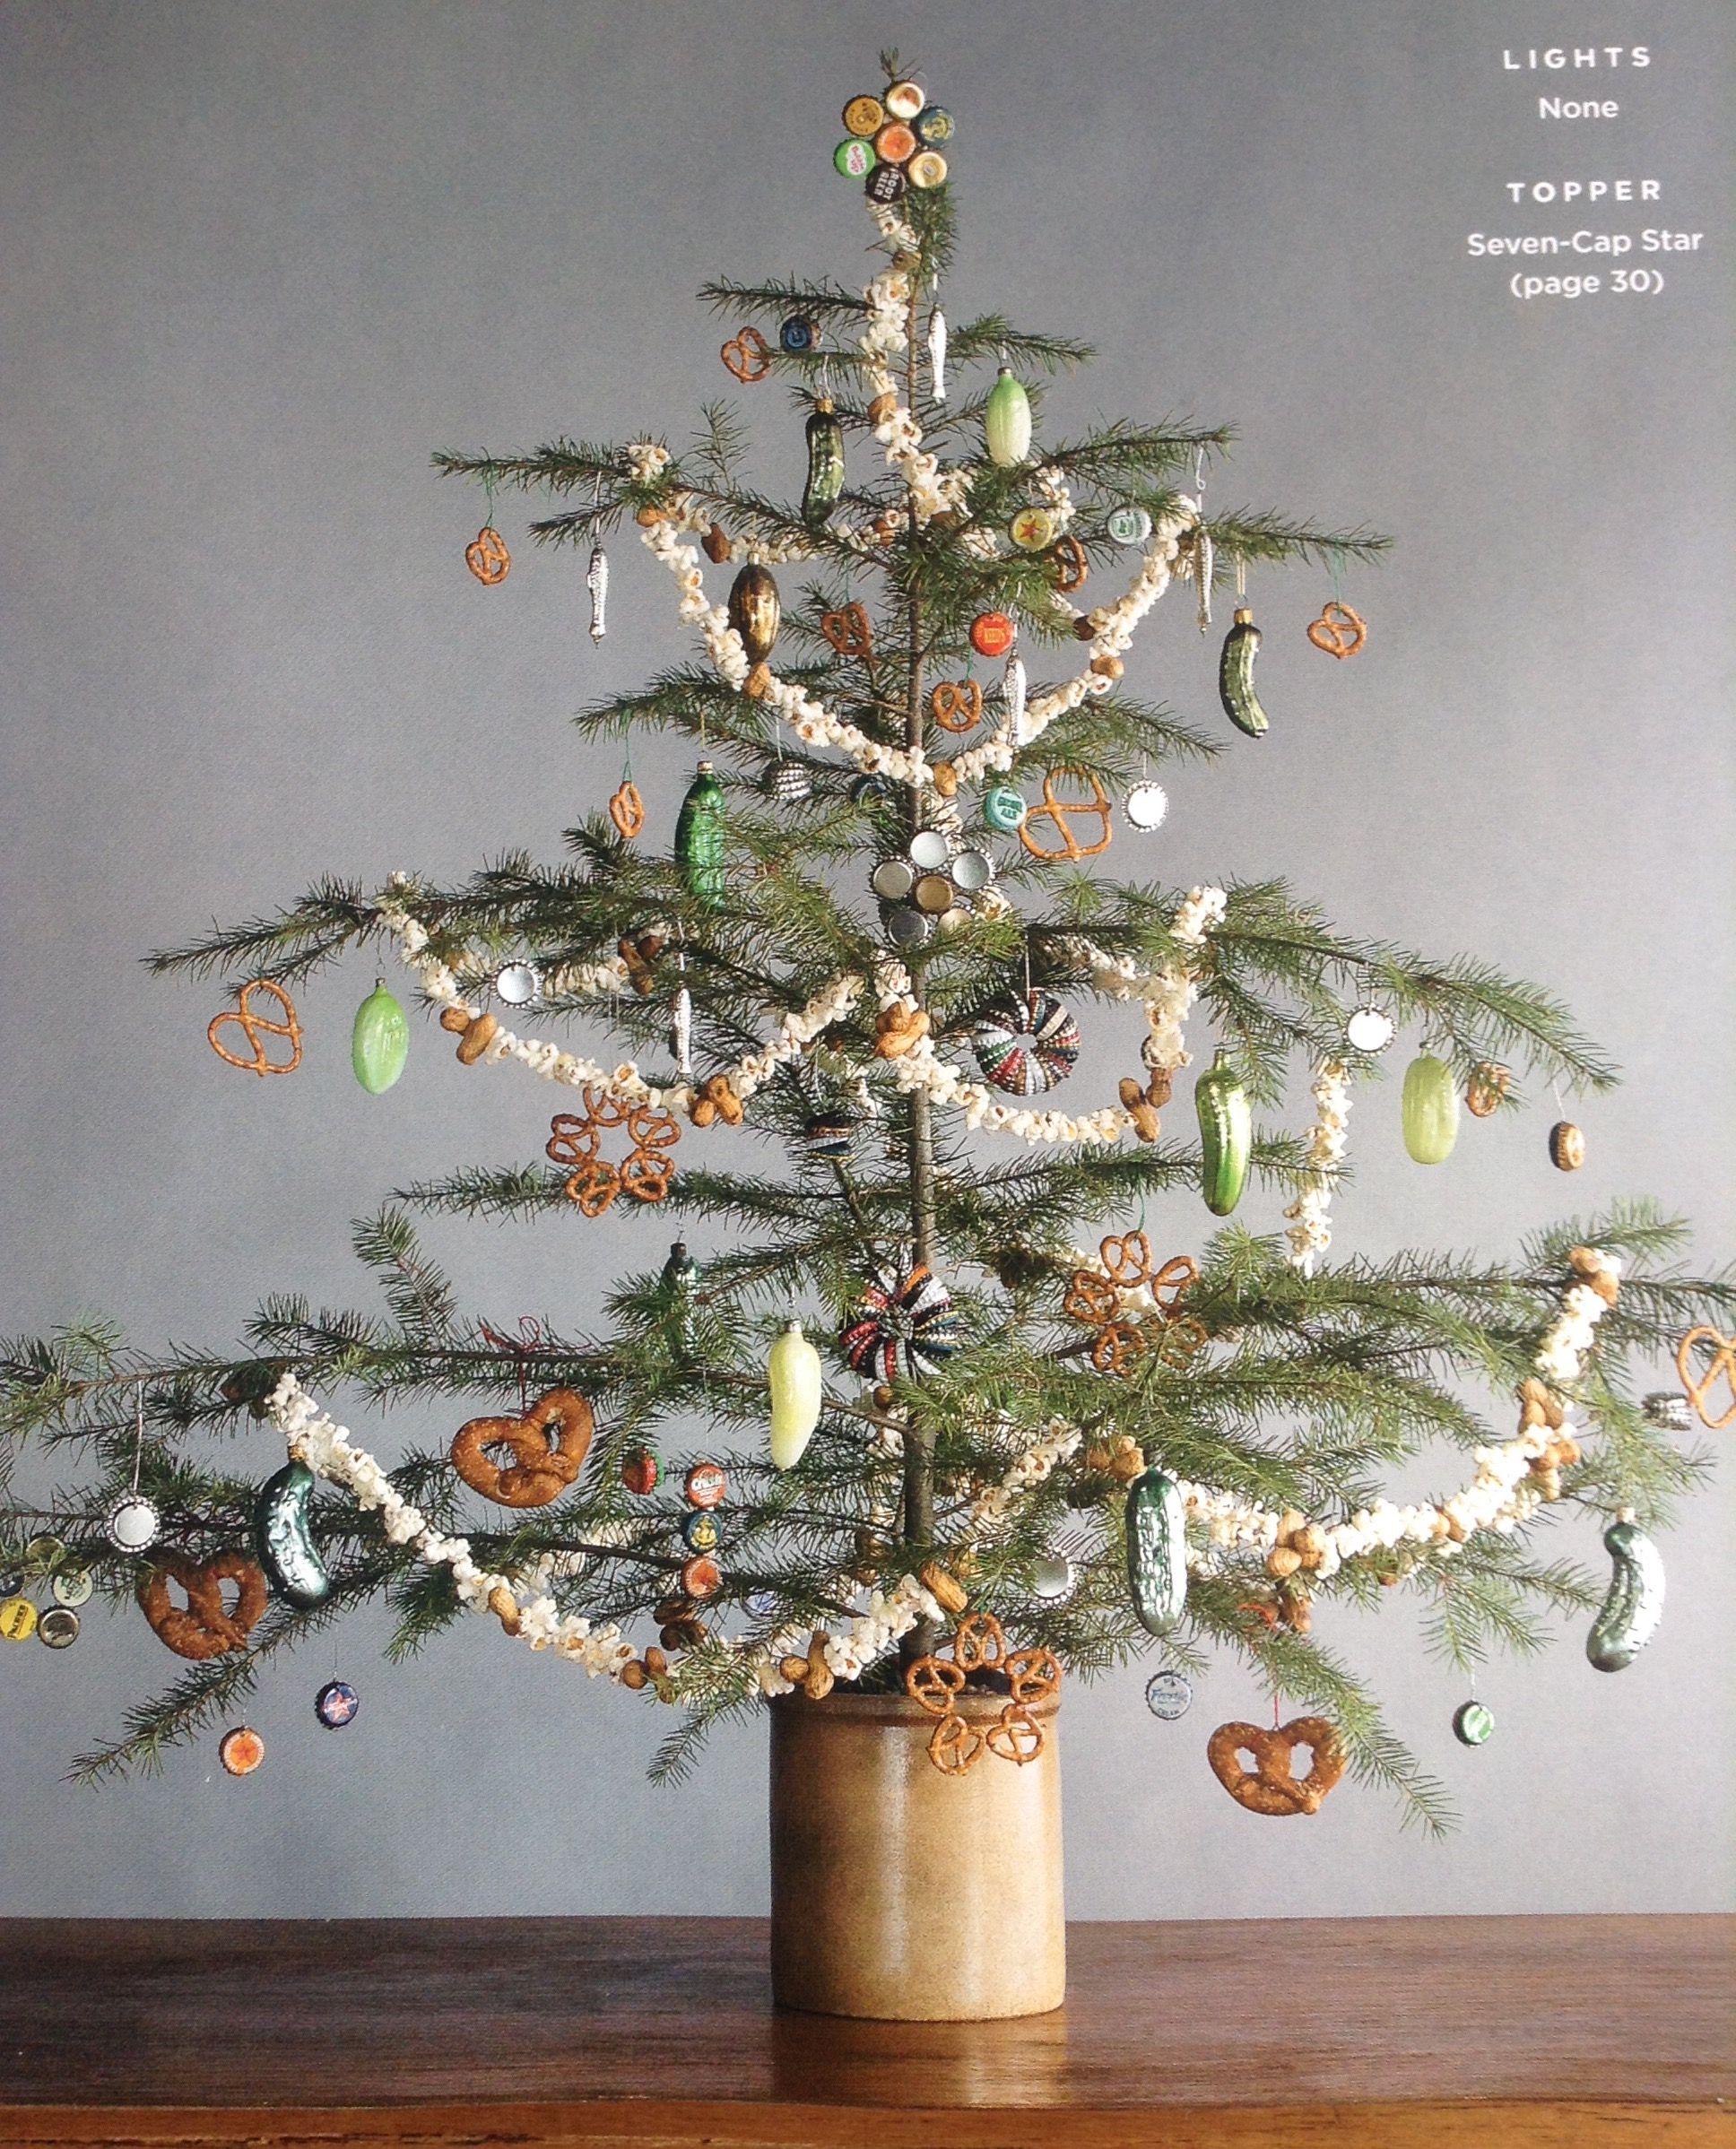 Foraged Tree In Glazed Crock Bottle Cap Ornaments Christmas